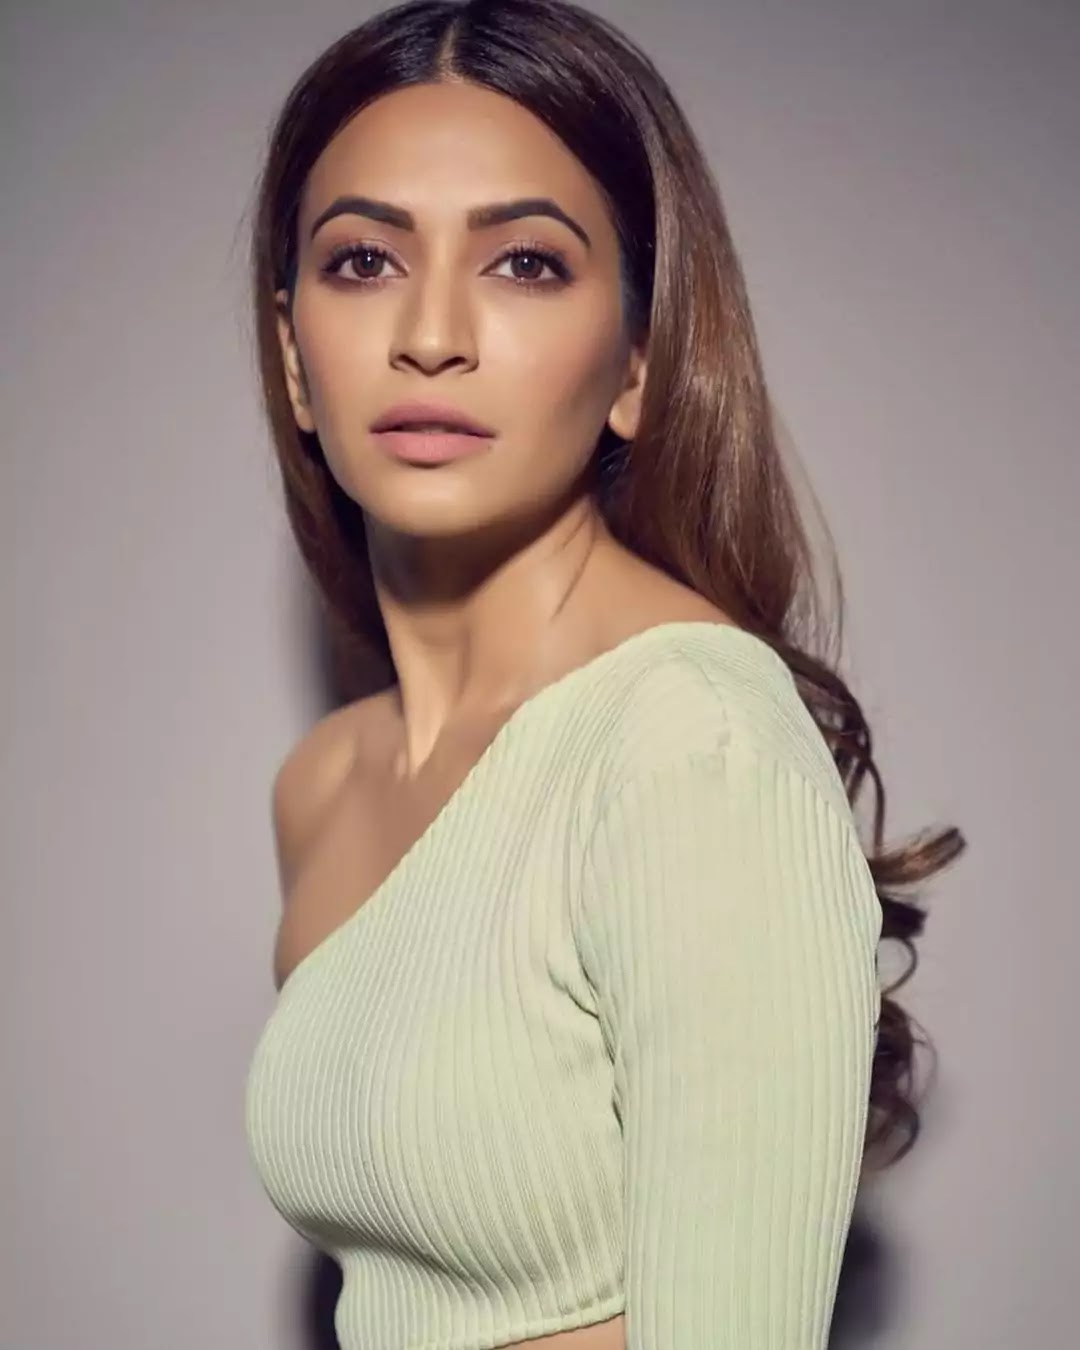 kriti-kharbhanda-hot-and-sexy-looks-in-light-green-co-ord-set